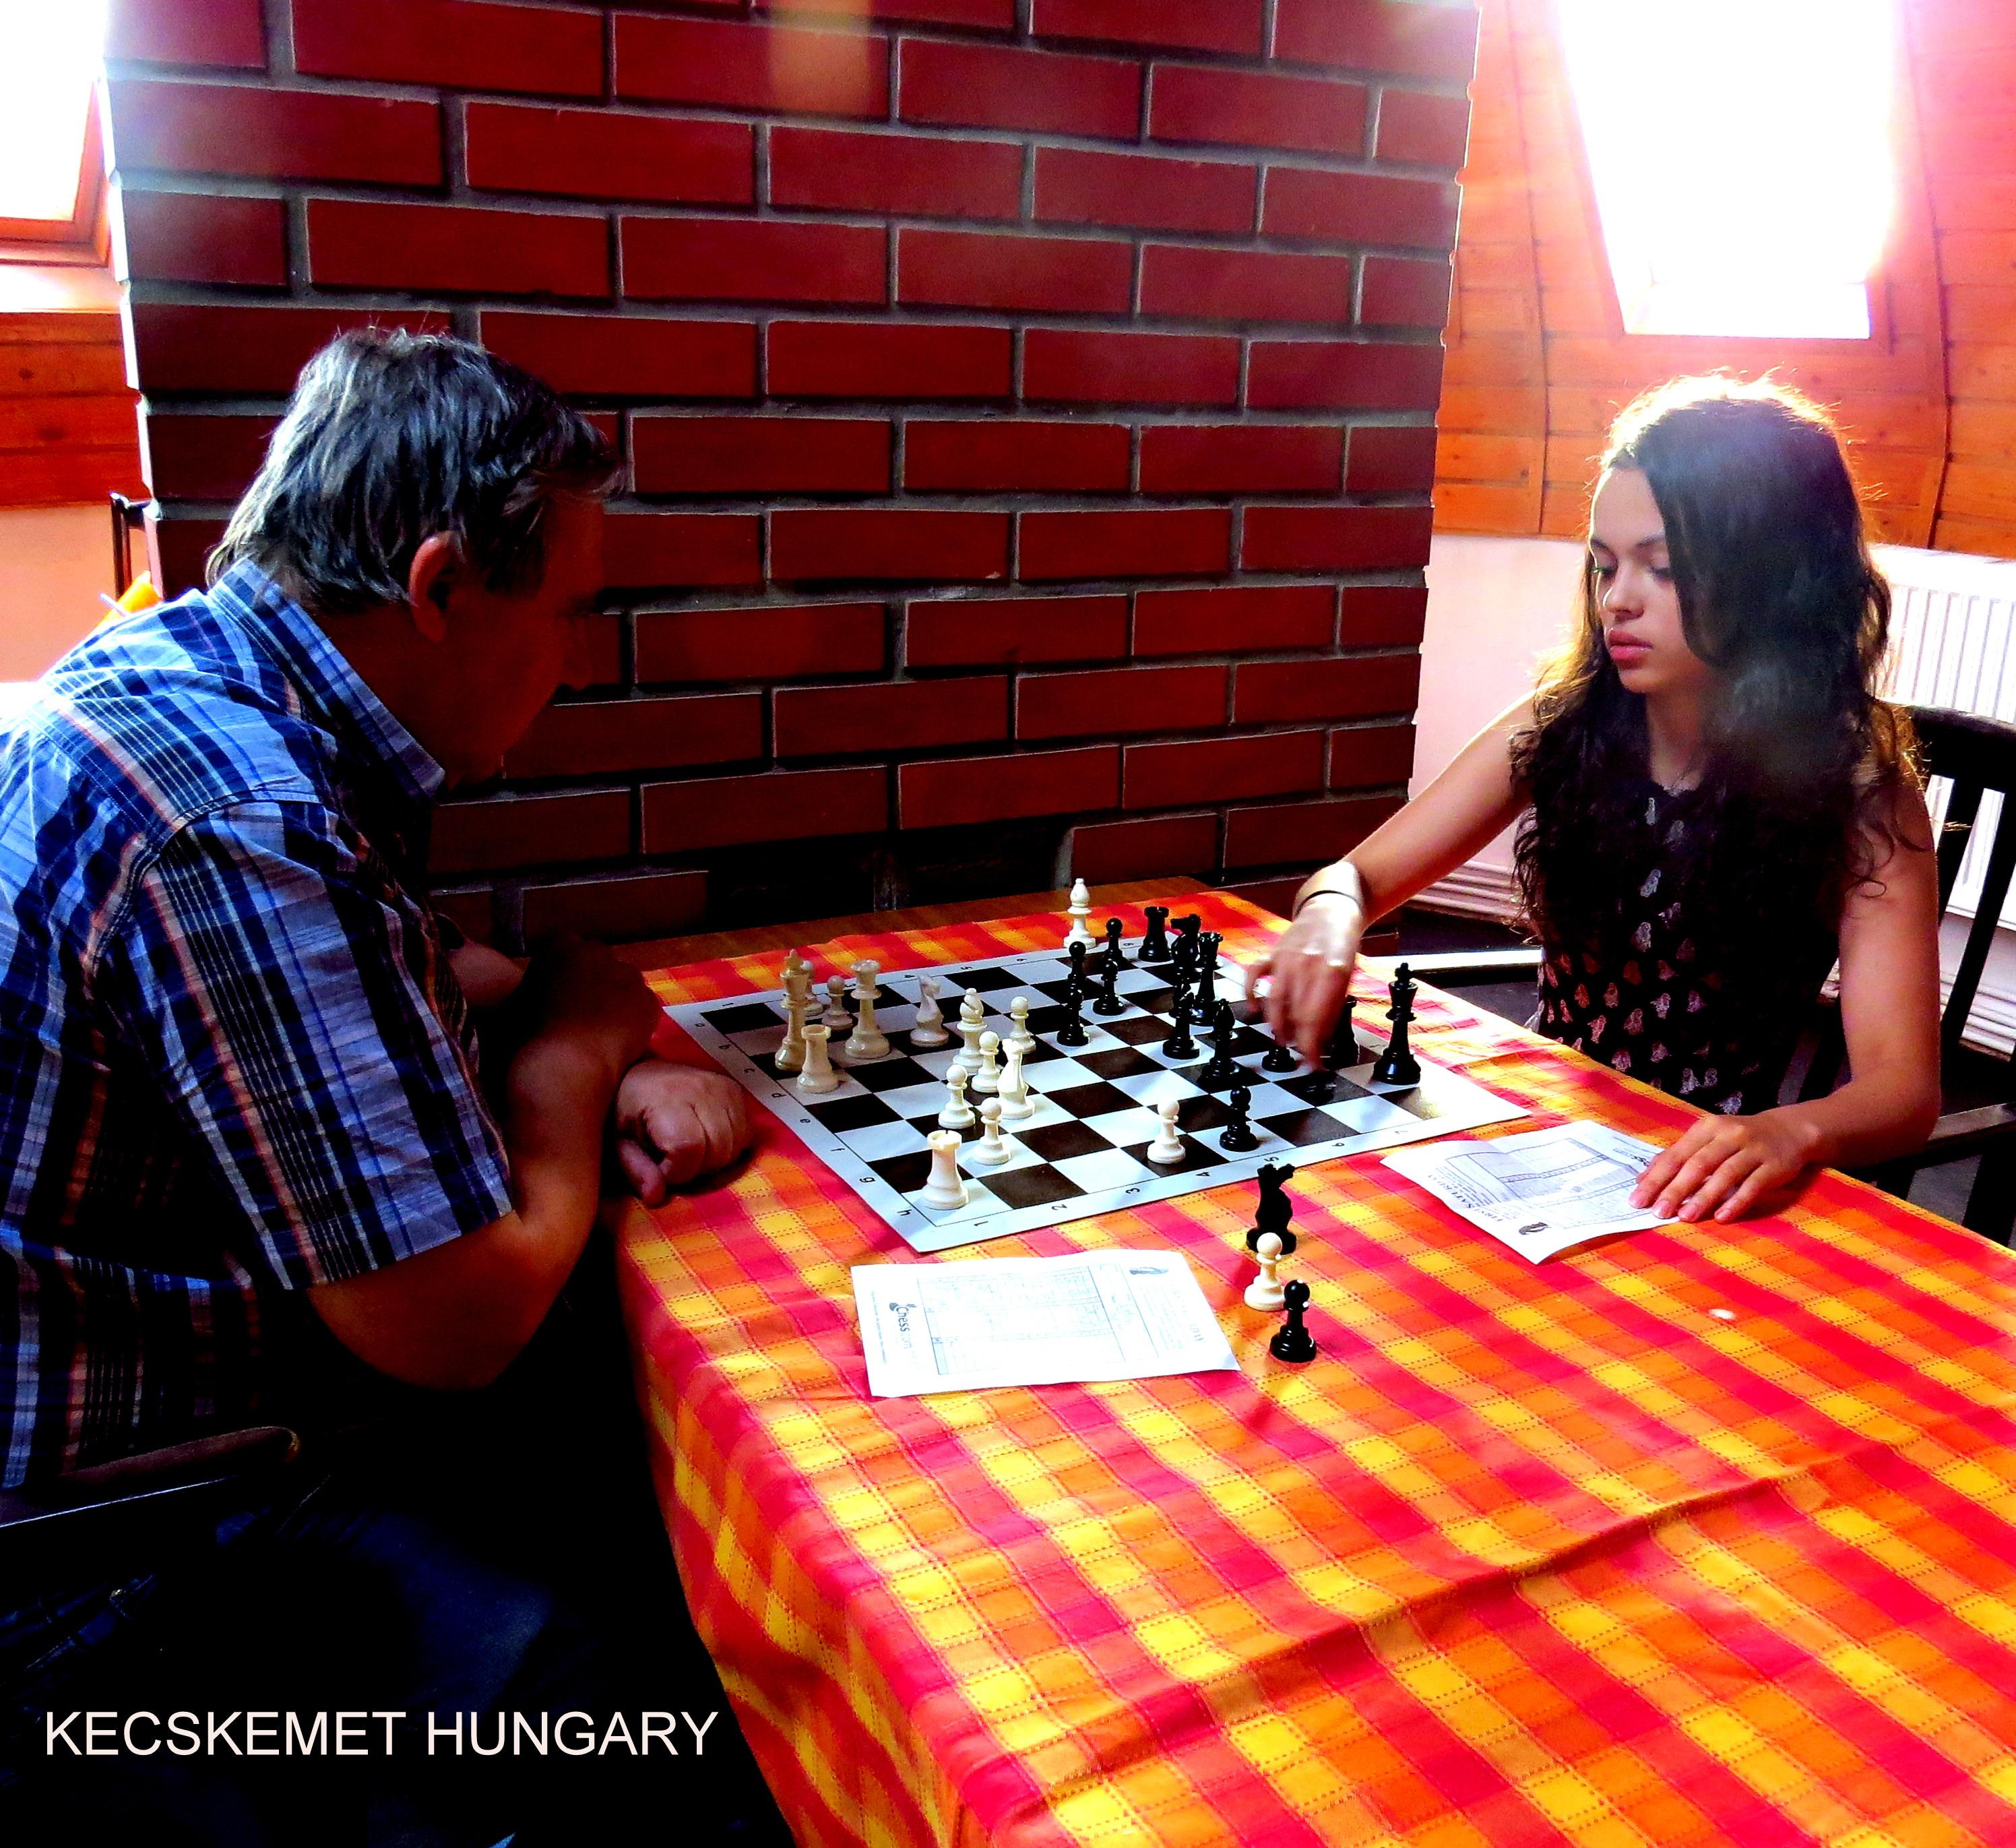 Chess in Kecskemet